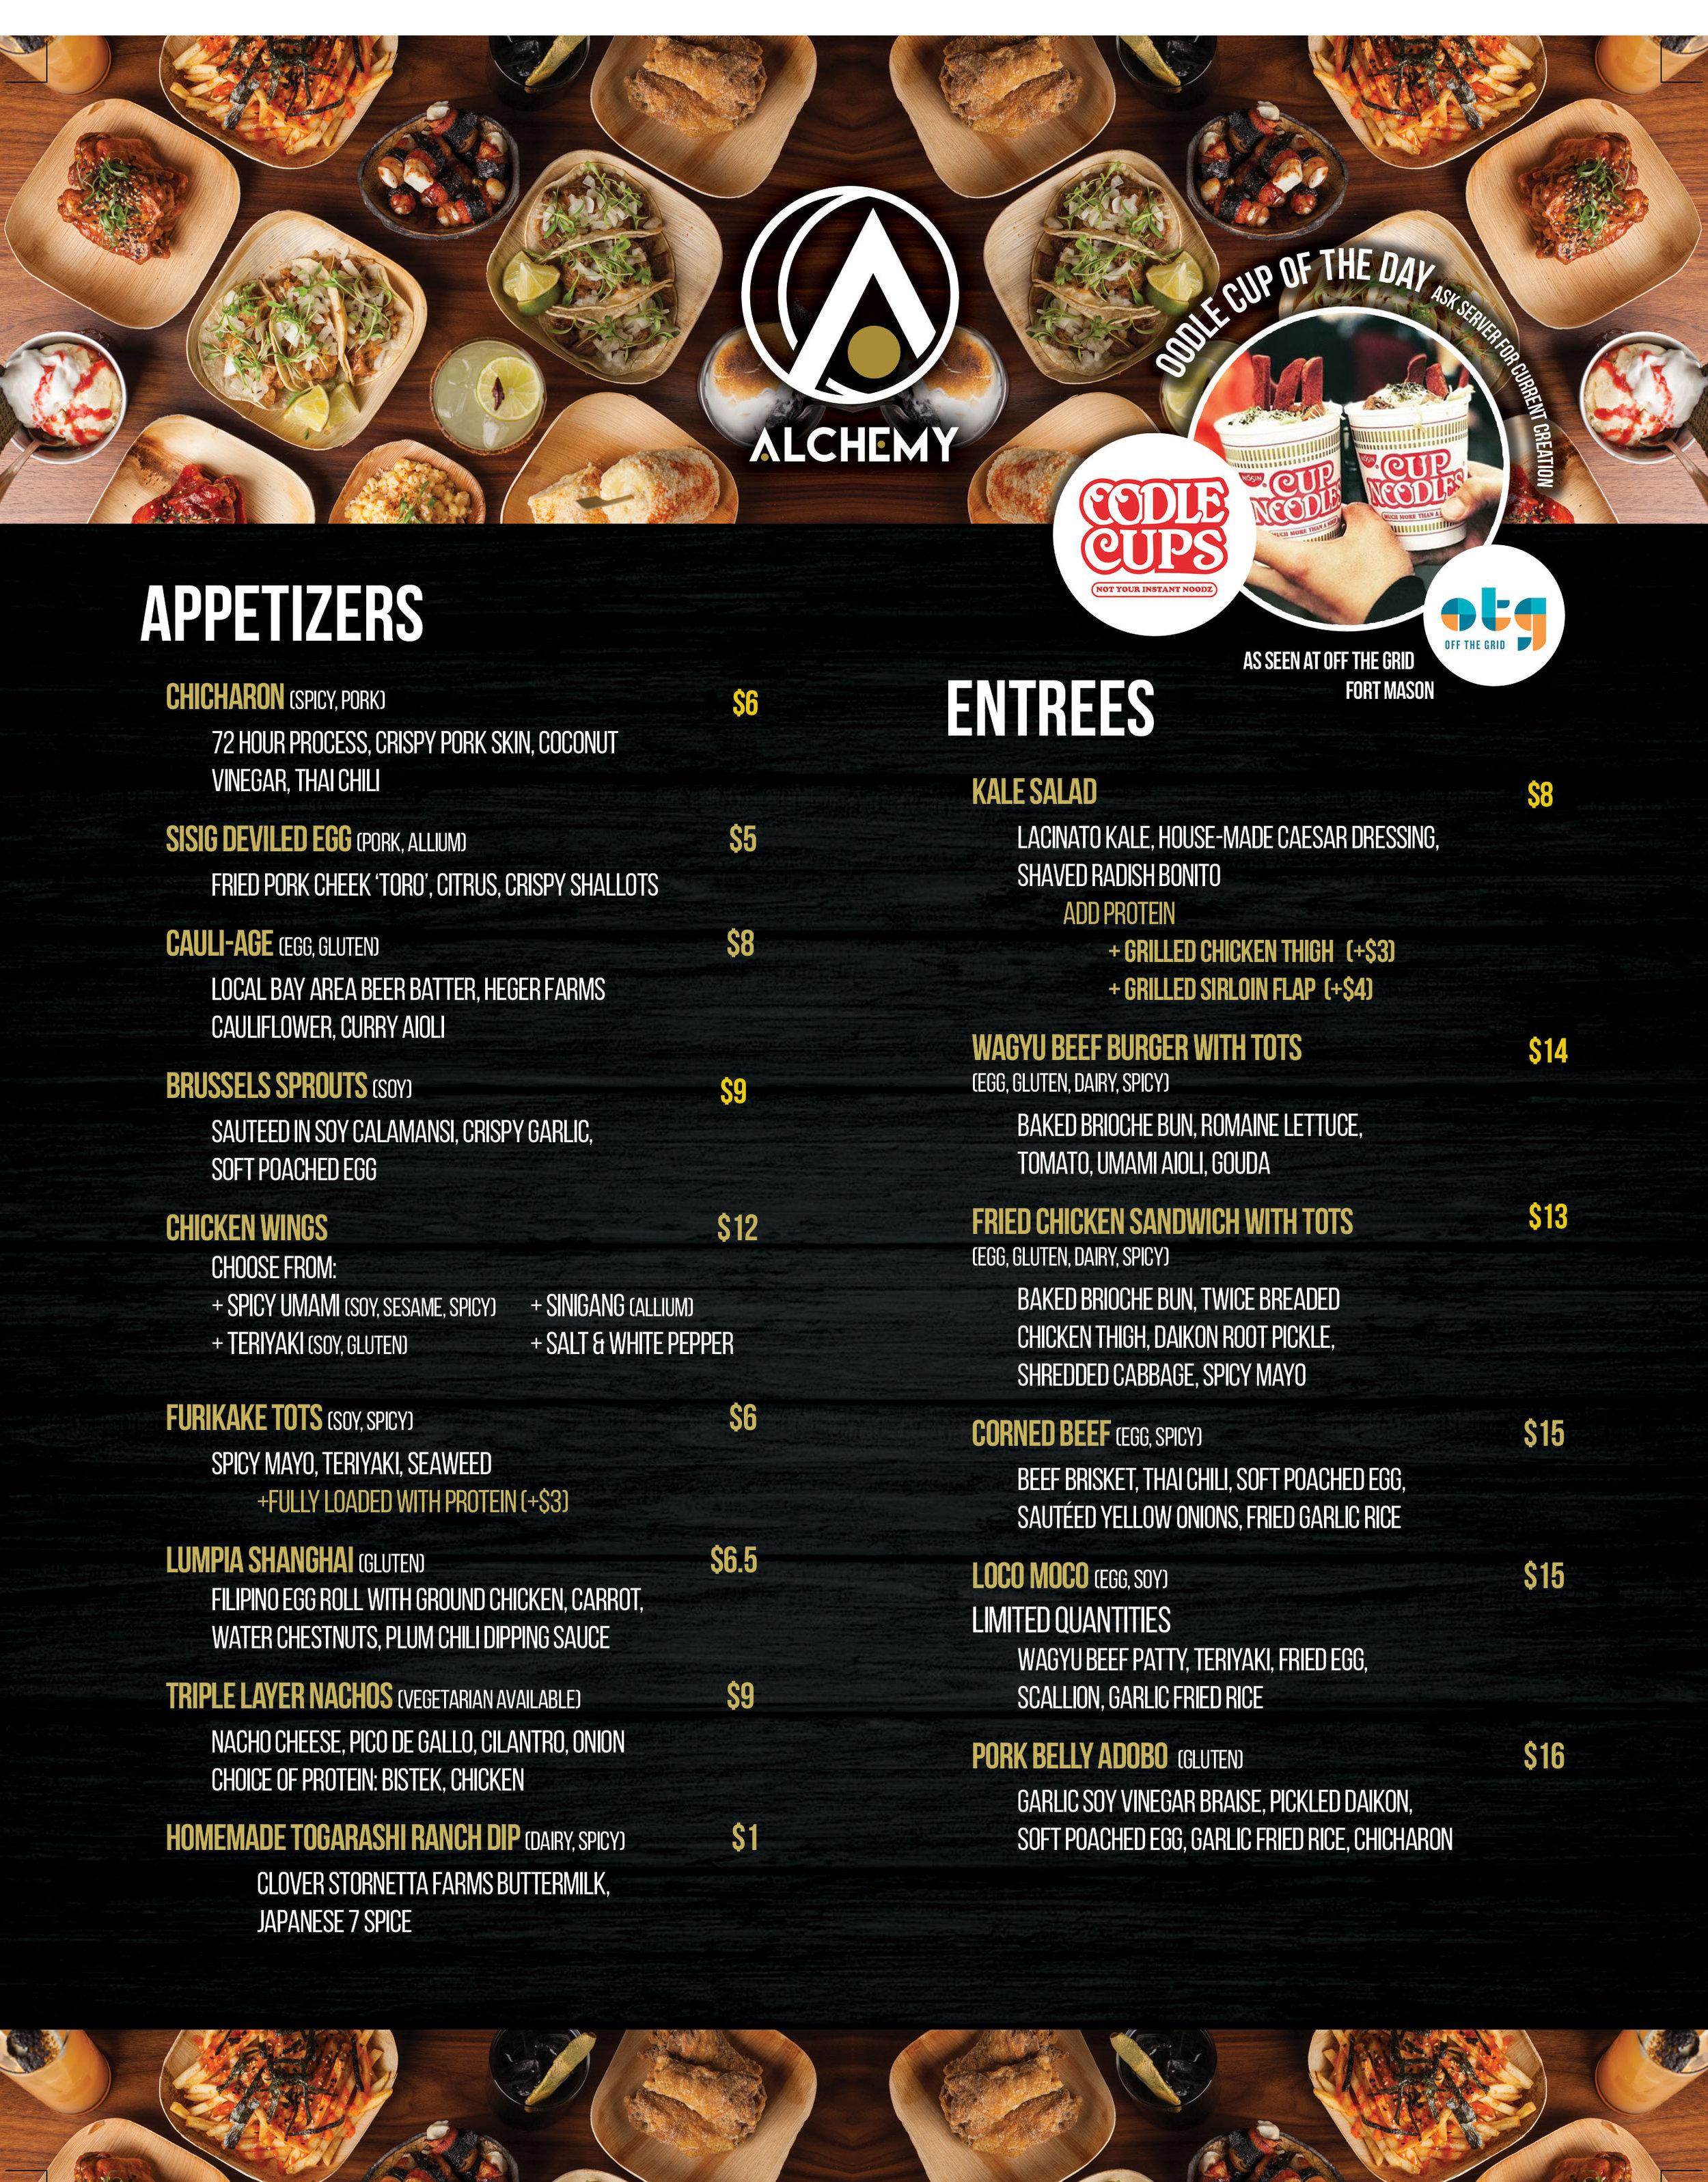 NEW ALC_menu_070919_back_edit_926.jpg